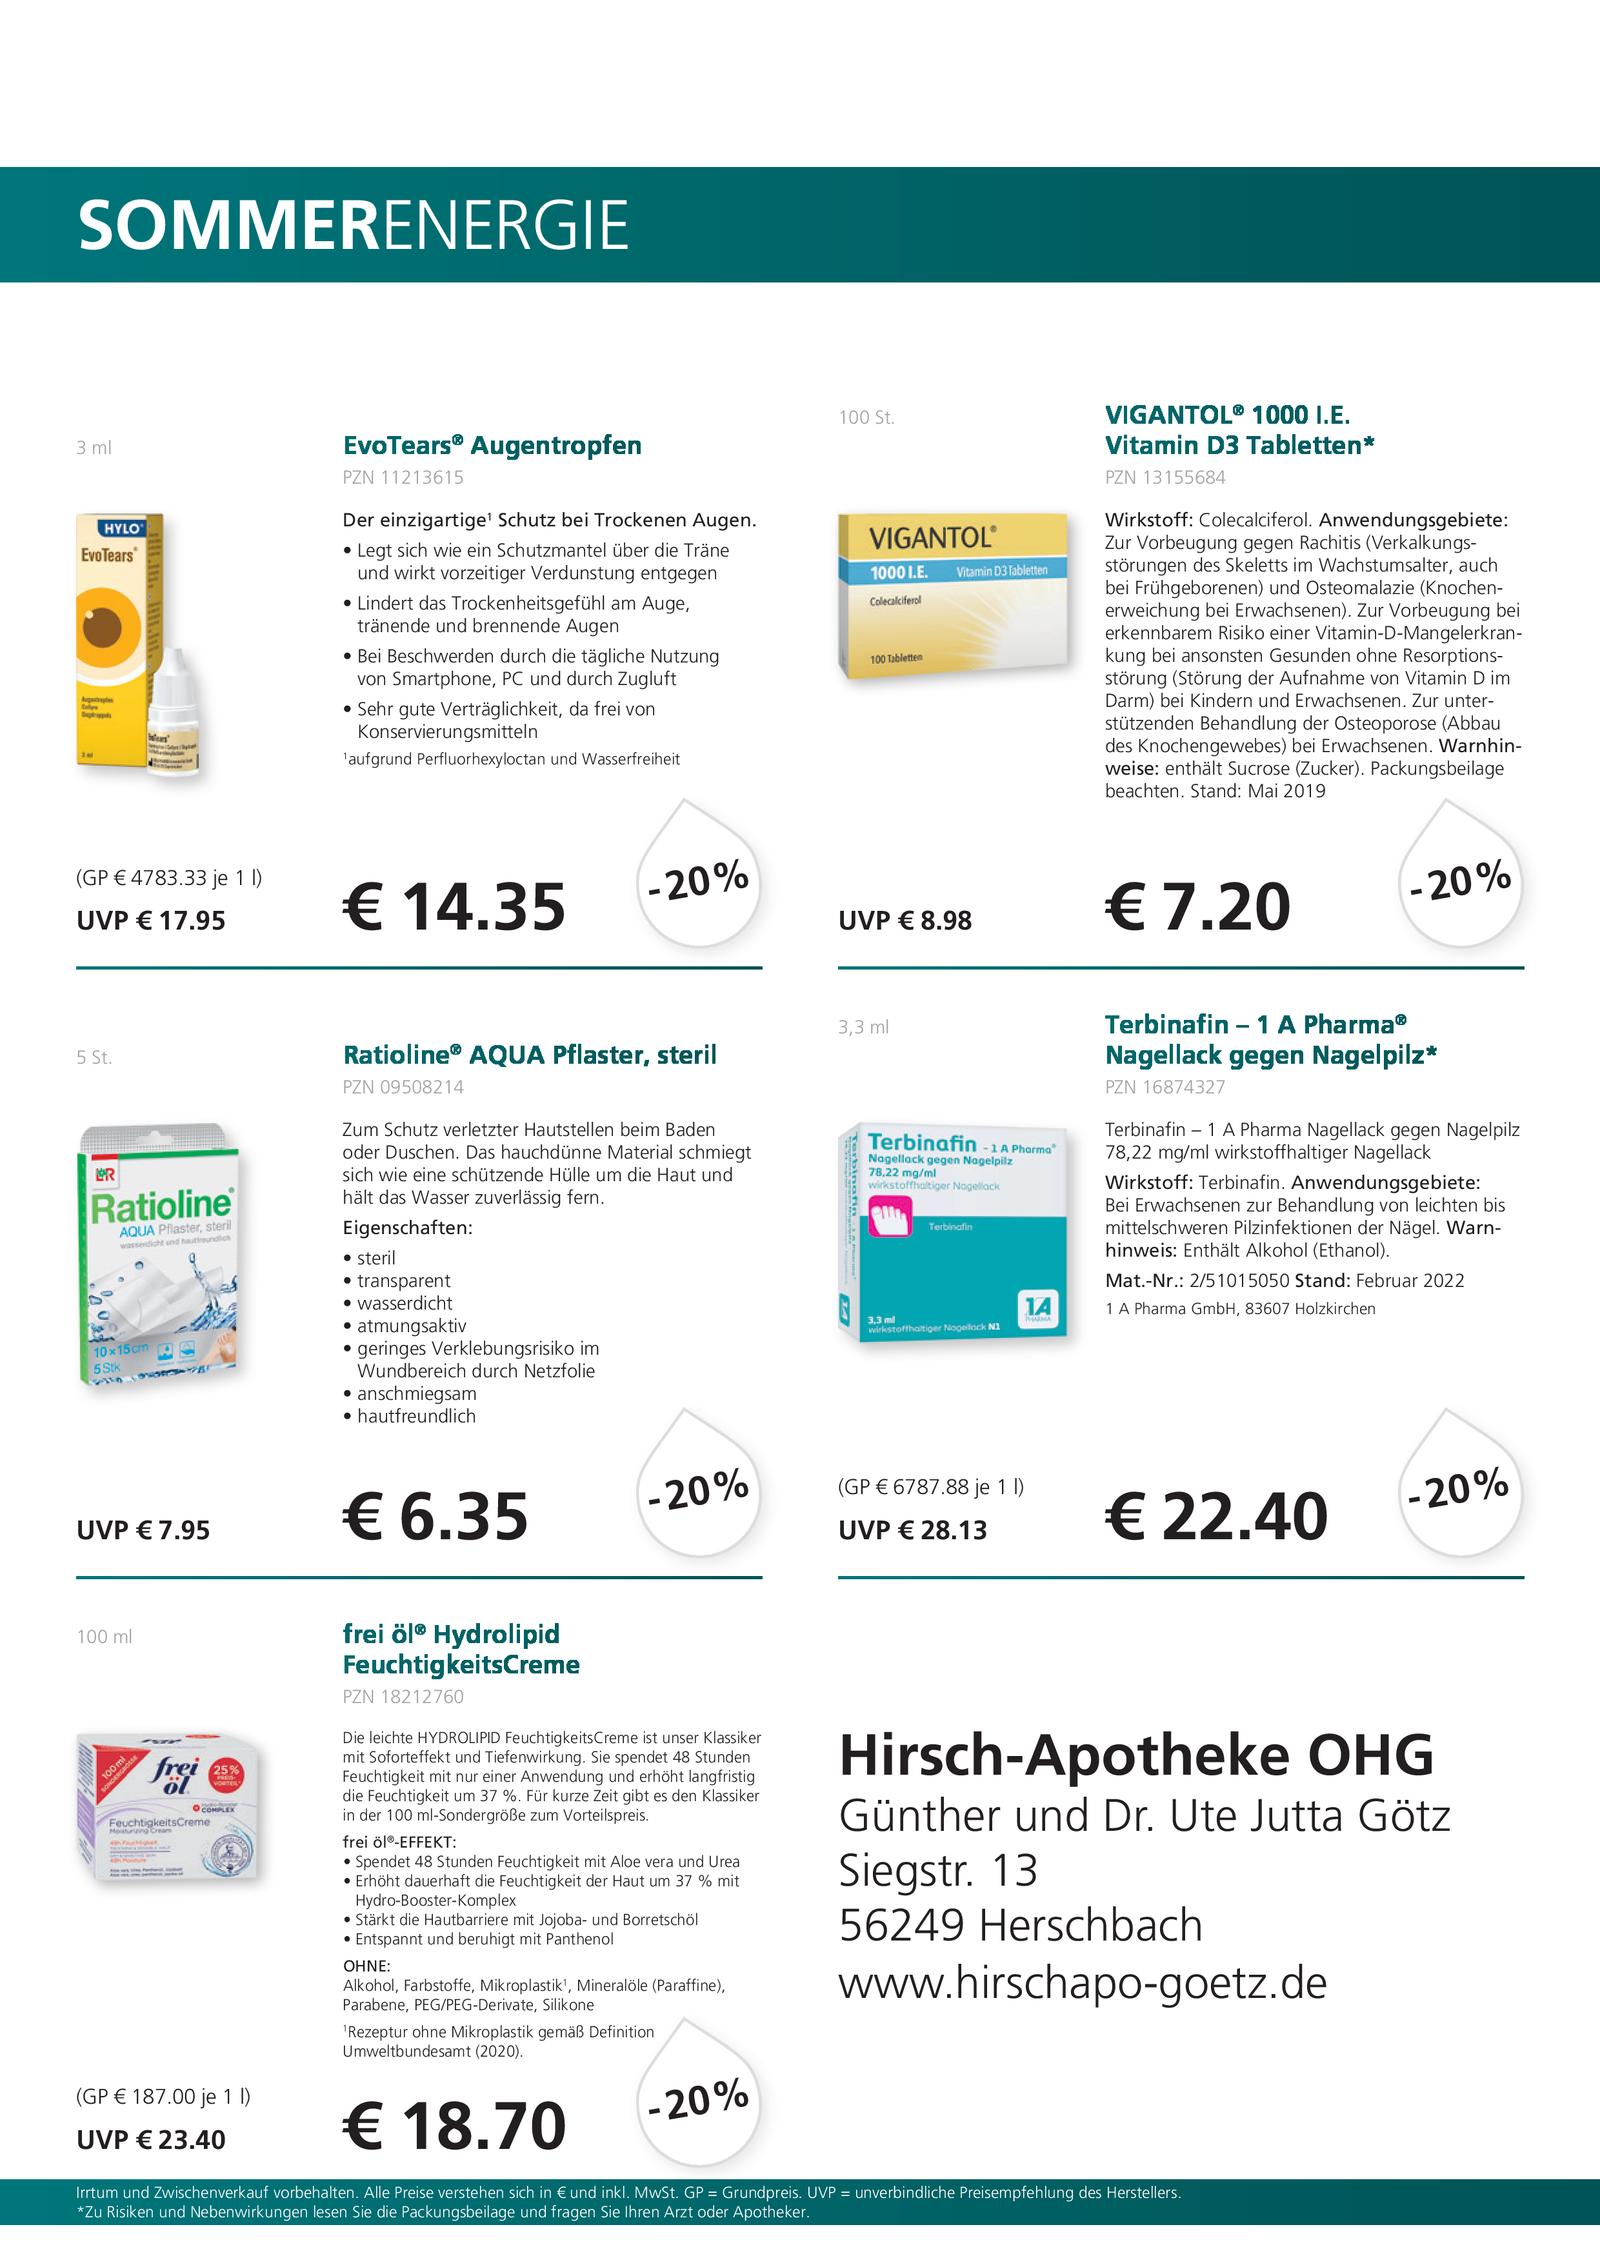 https://mein-uploads.apocdn.net/17664/leaflets/17664_flyer-Seite4.png